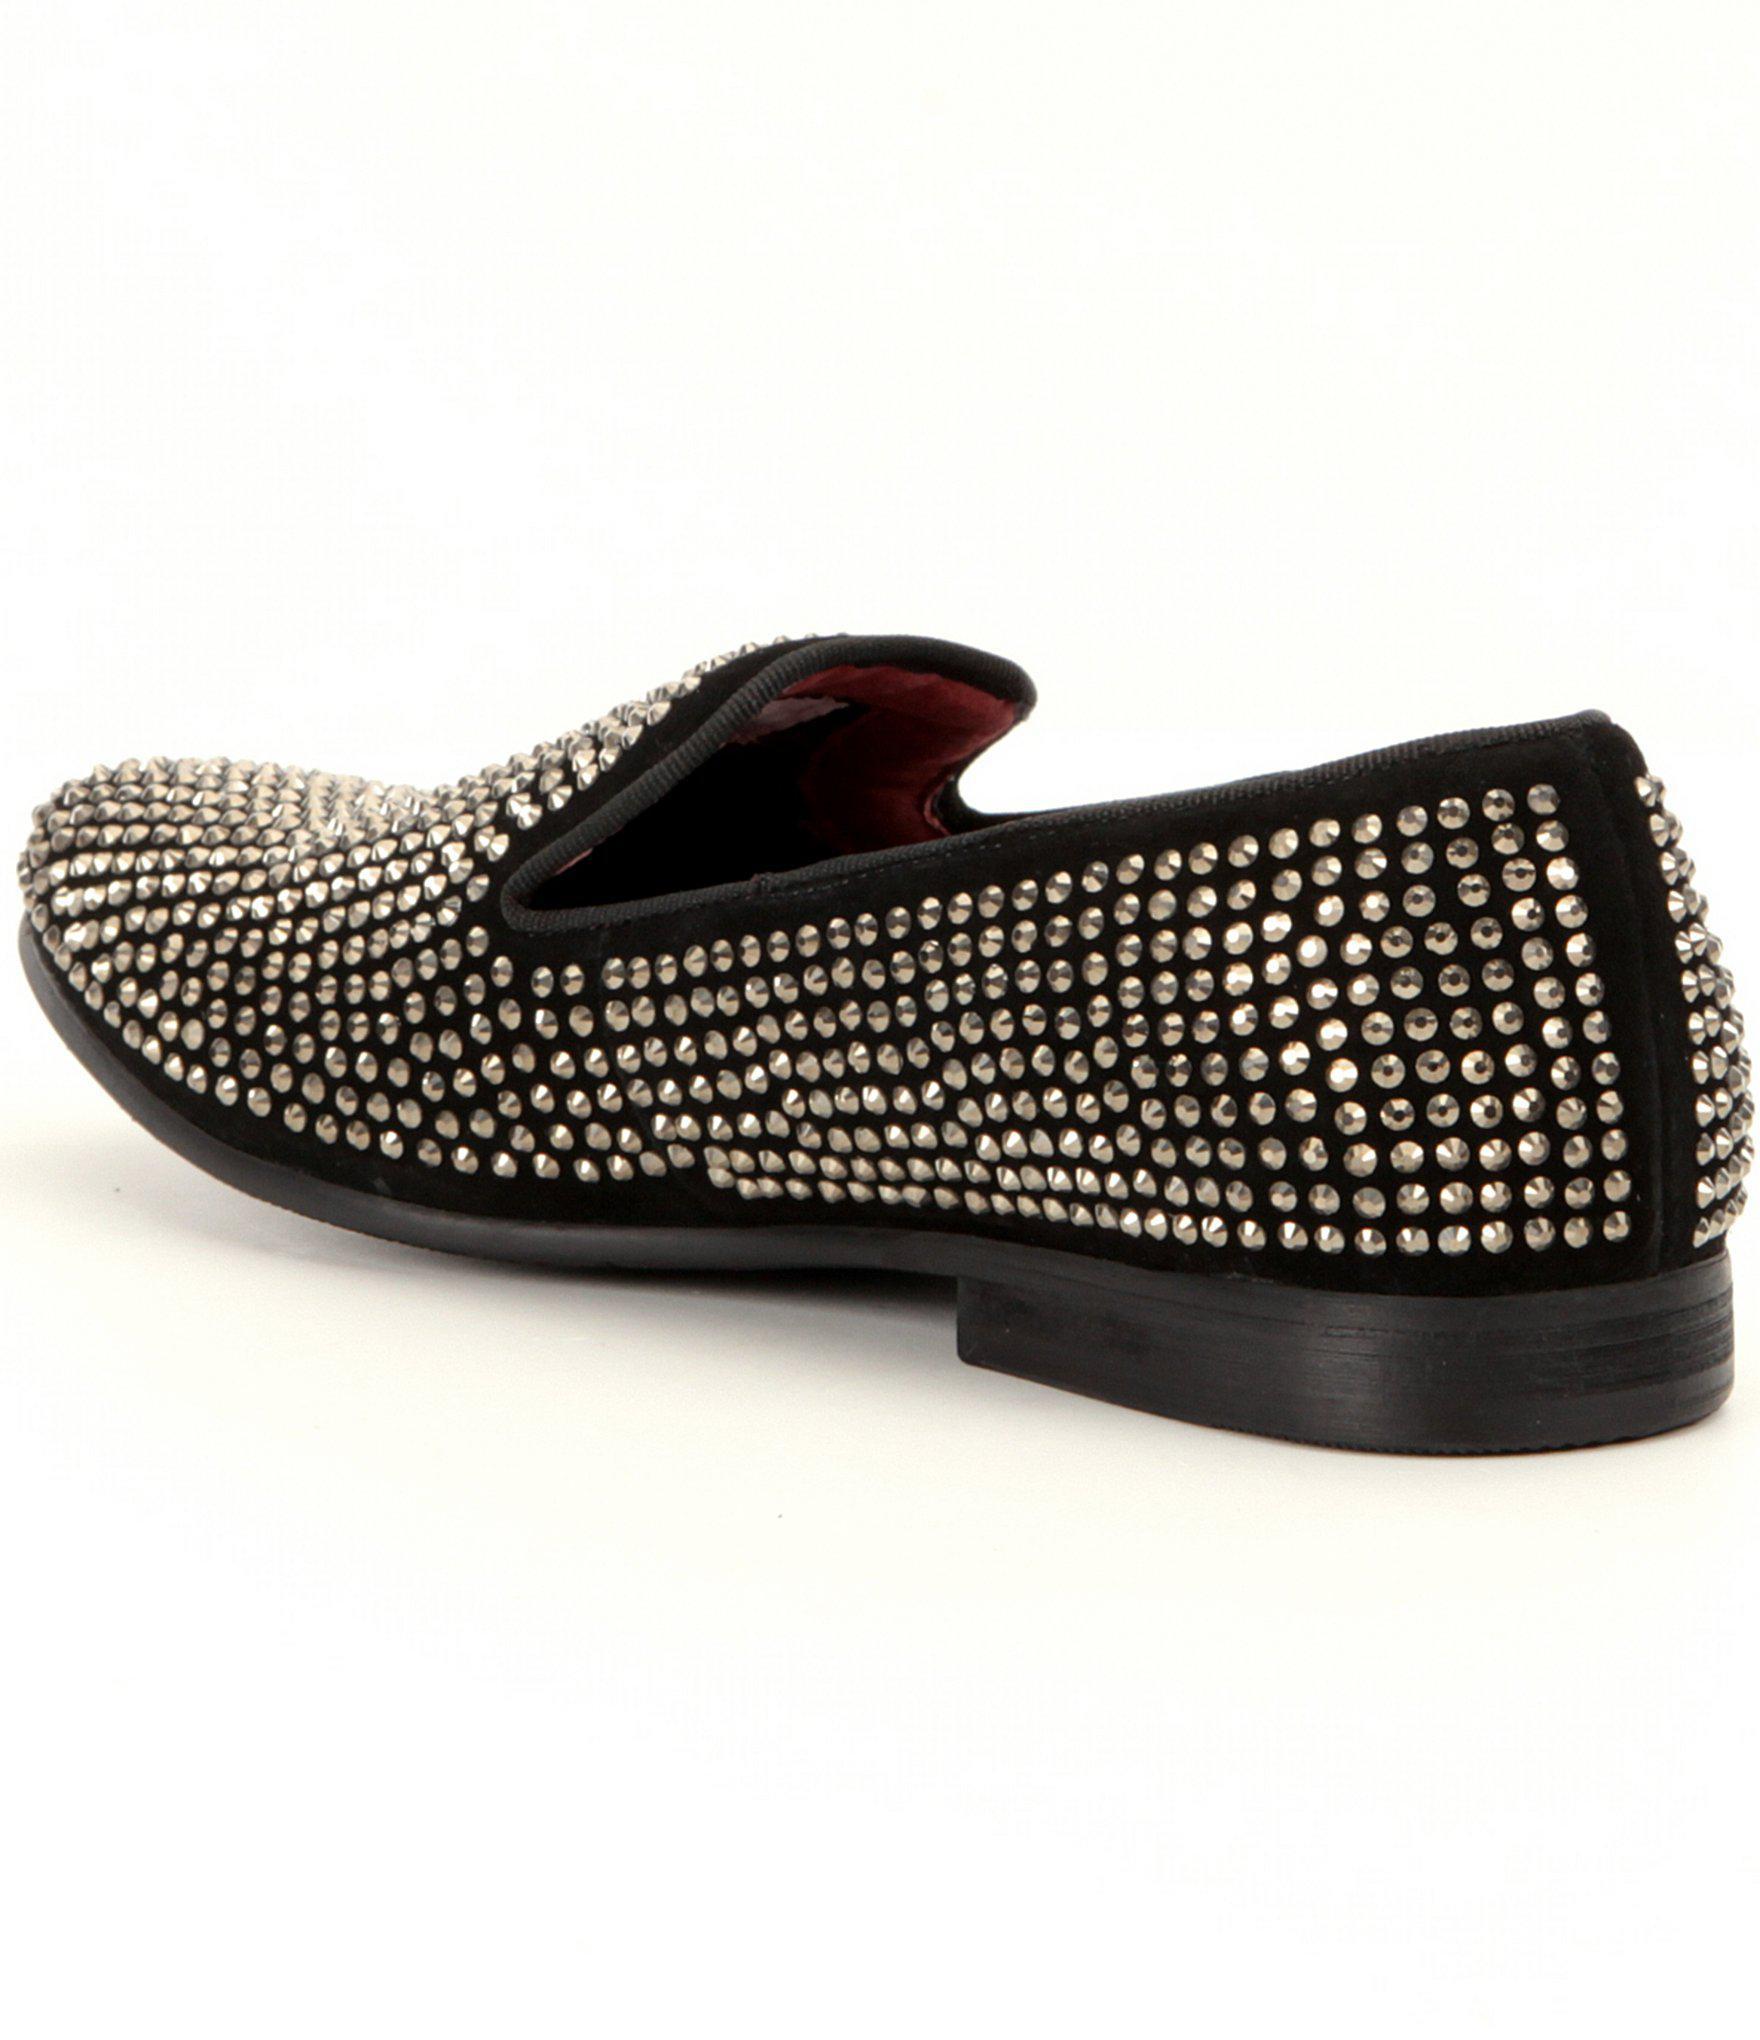 0a2bd0c708f Black Men ́s Caviarr Crystal Embellishment Slip On Loafer